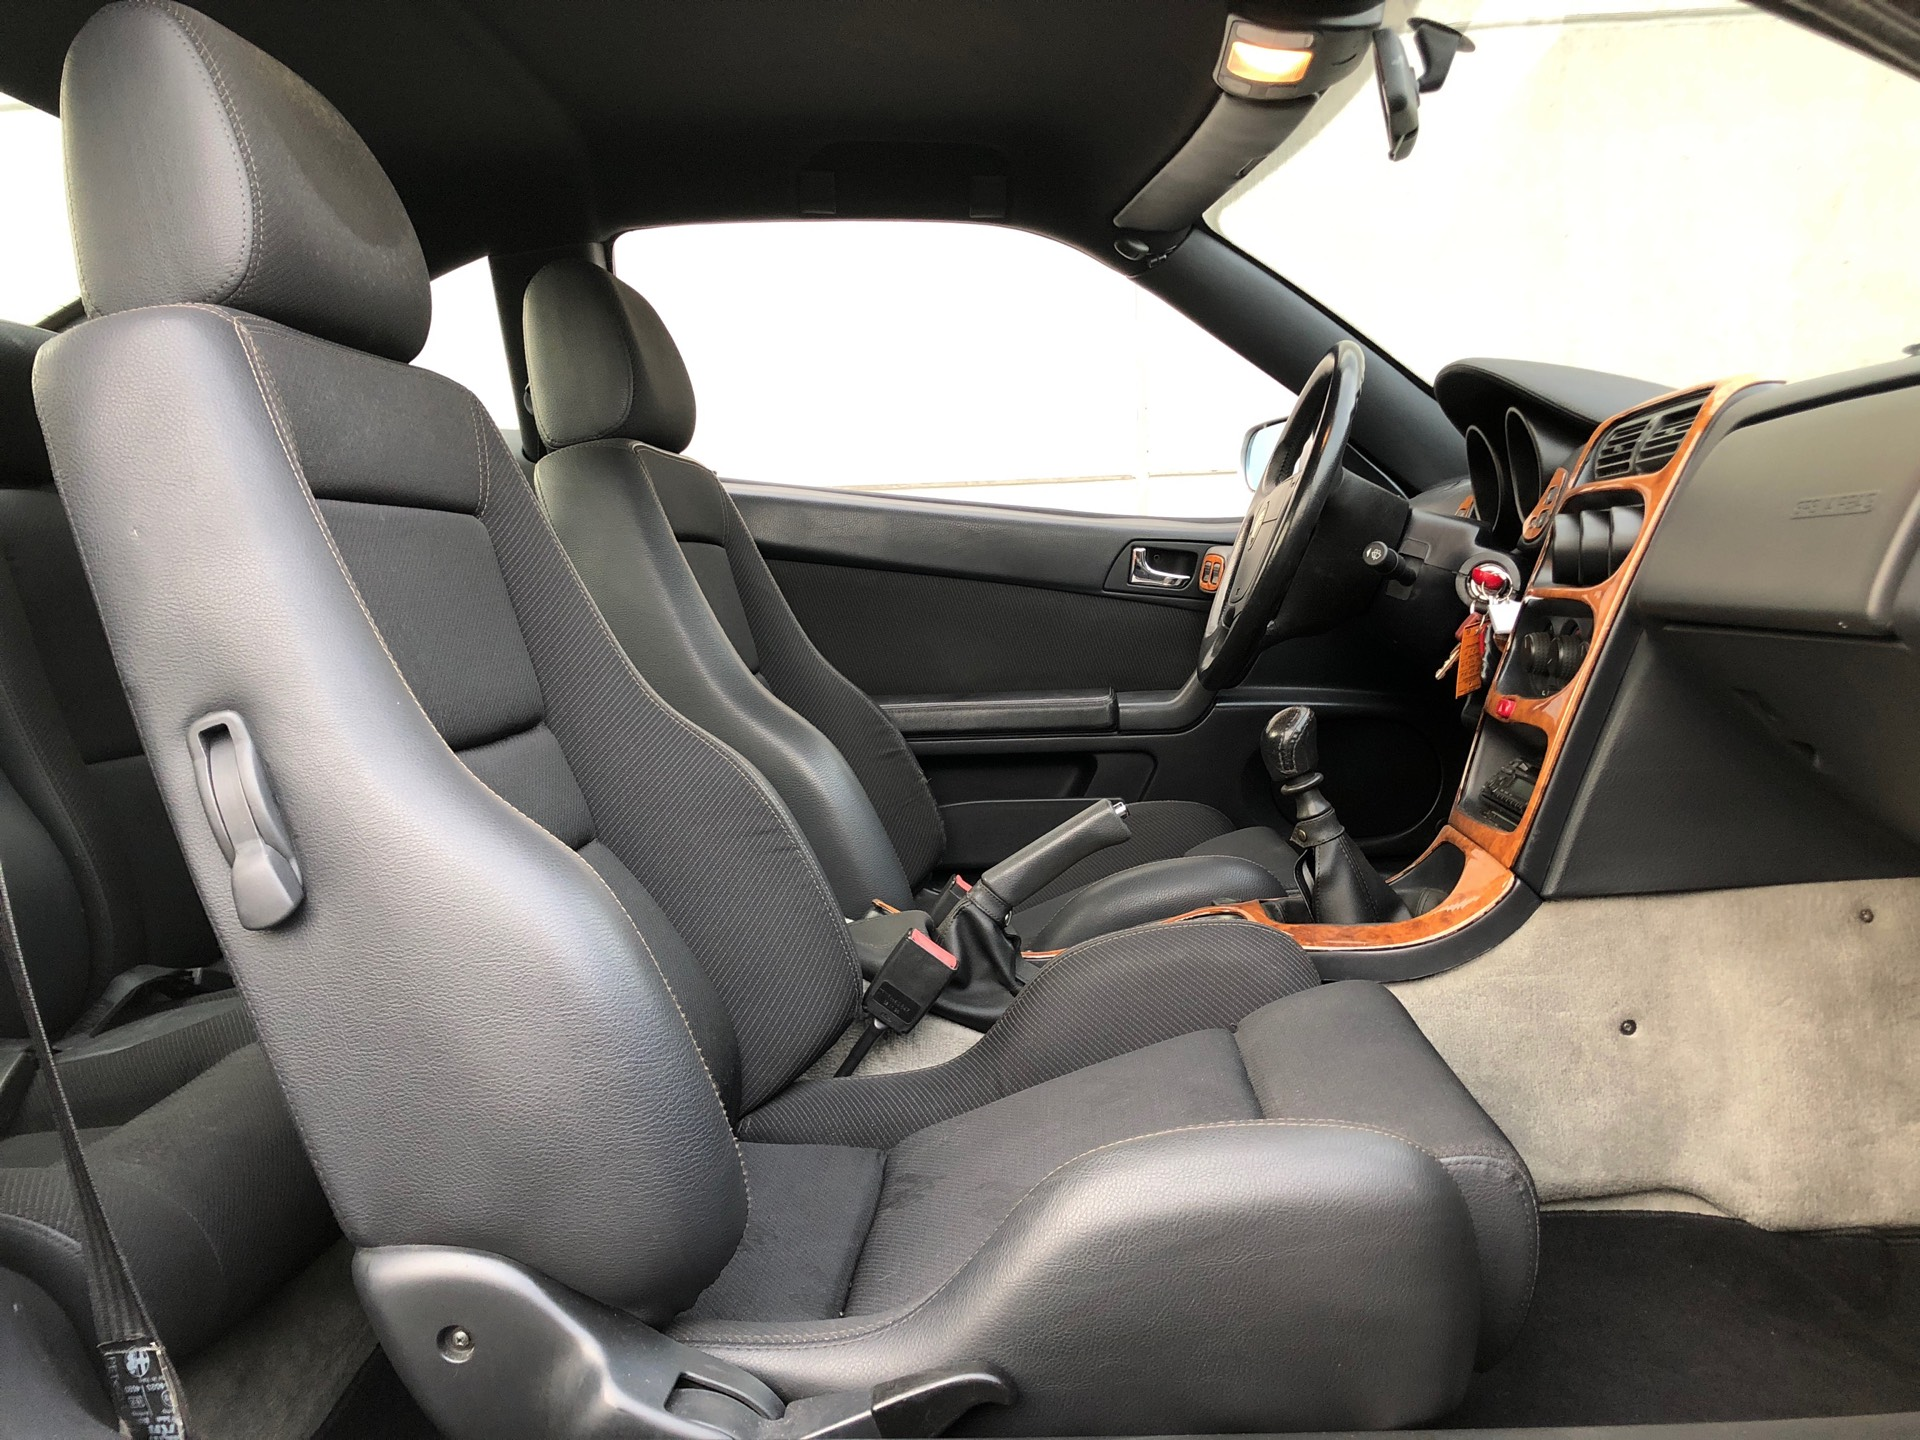 ALFA GTV 2.0 V6 TURBO